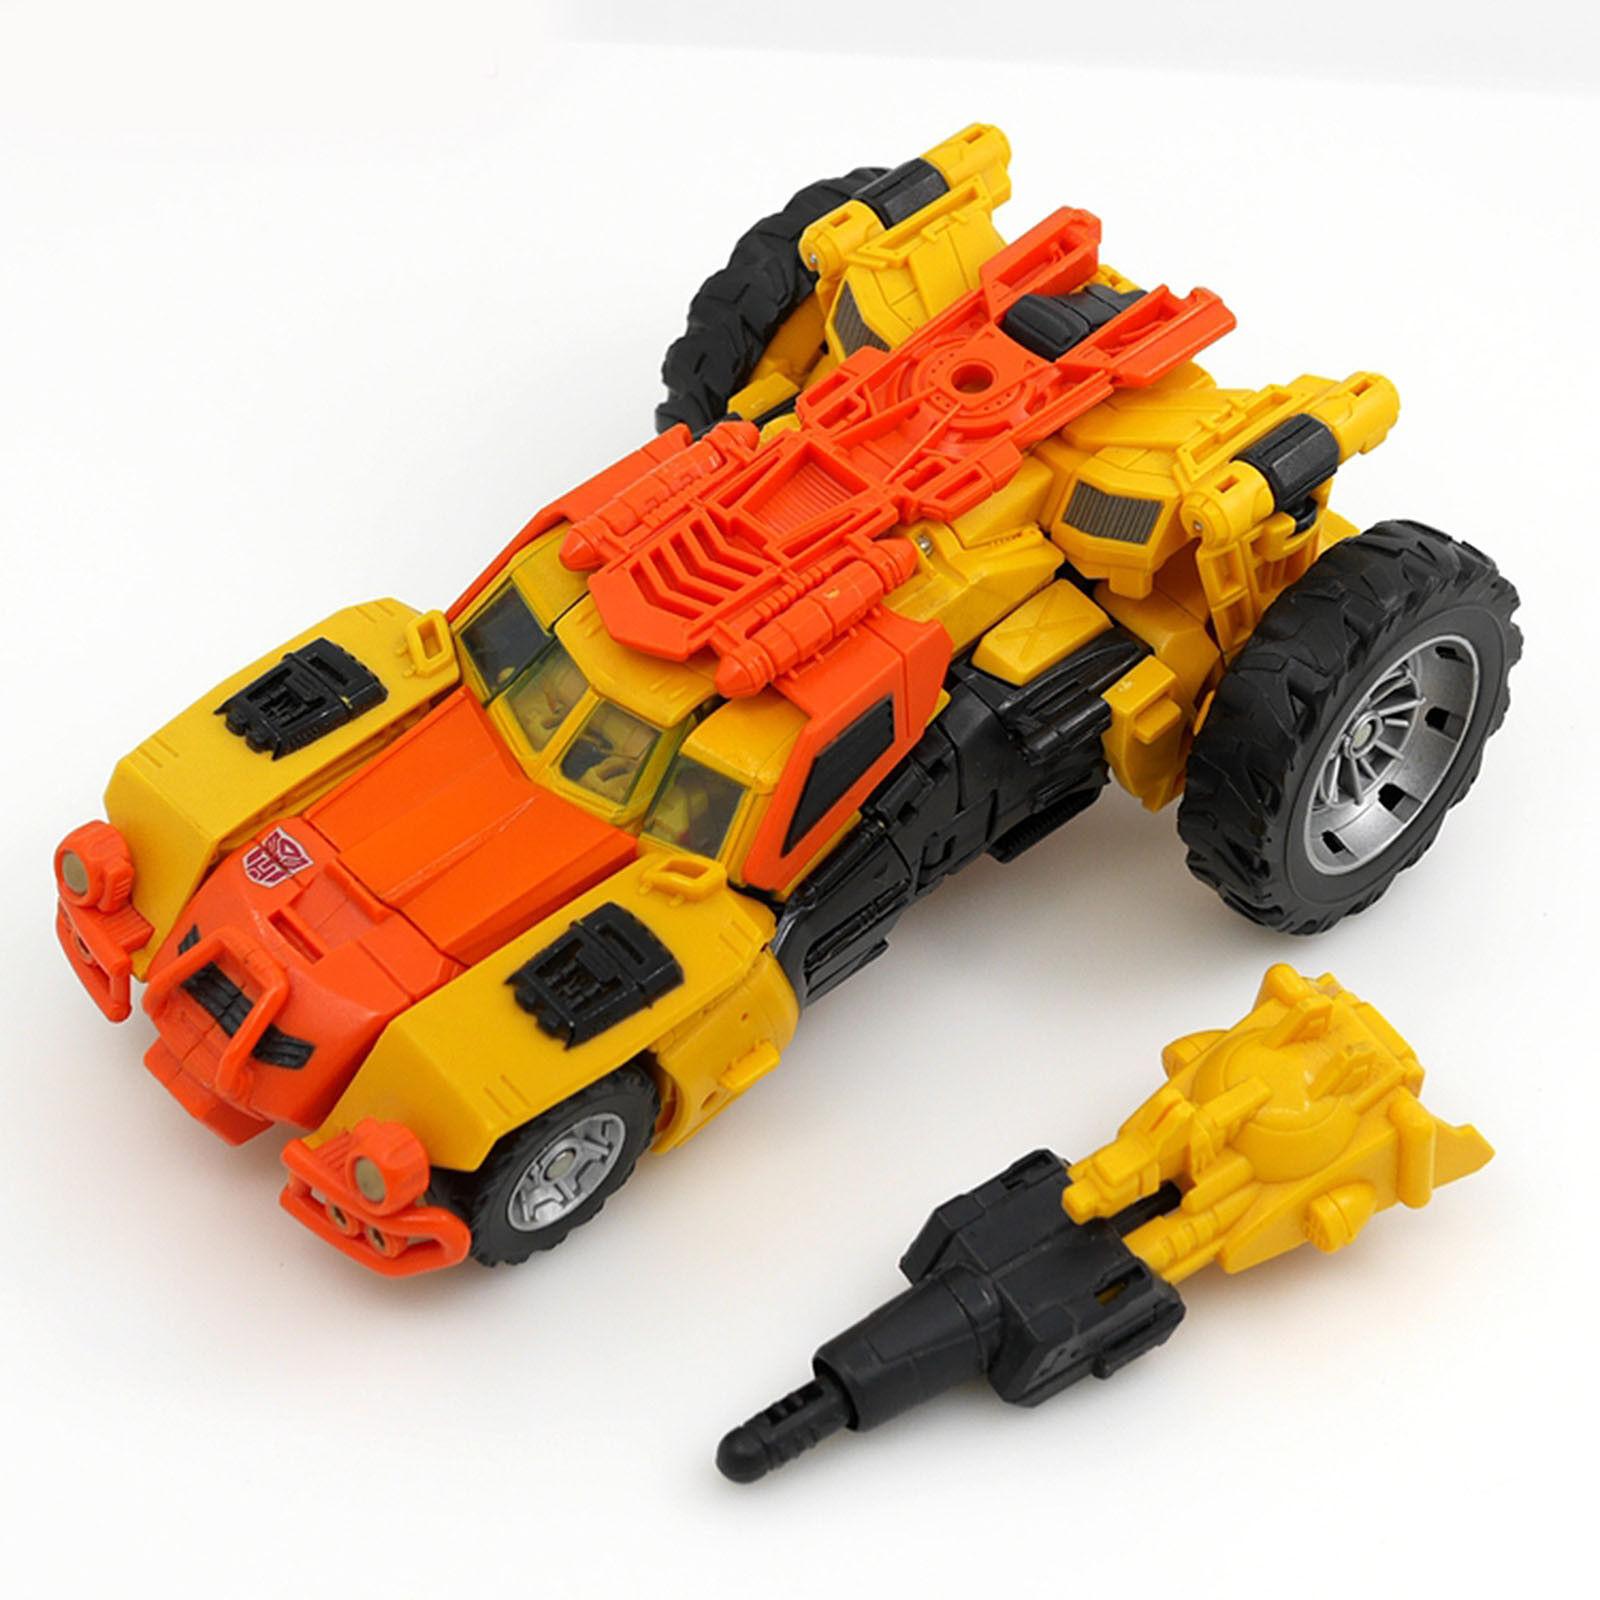 Transformers Generations IDW Voyager Class Sandstorm Triple changeur chrismas neuf